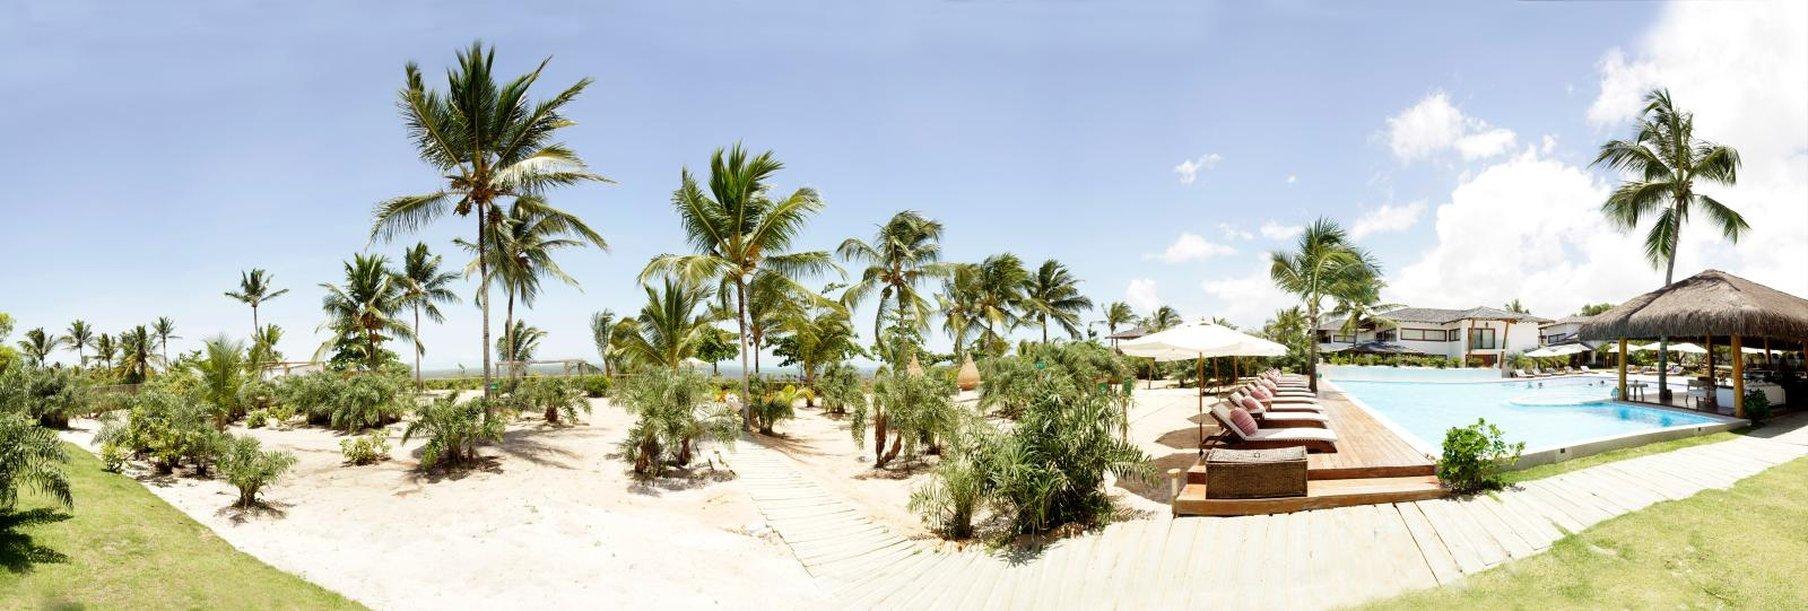 Campo Bahia